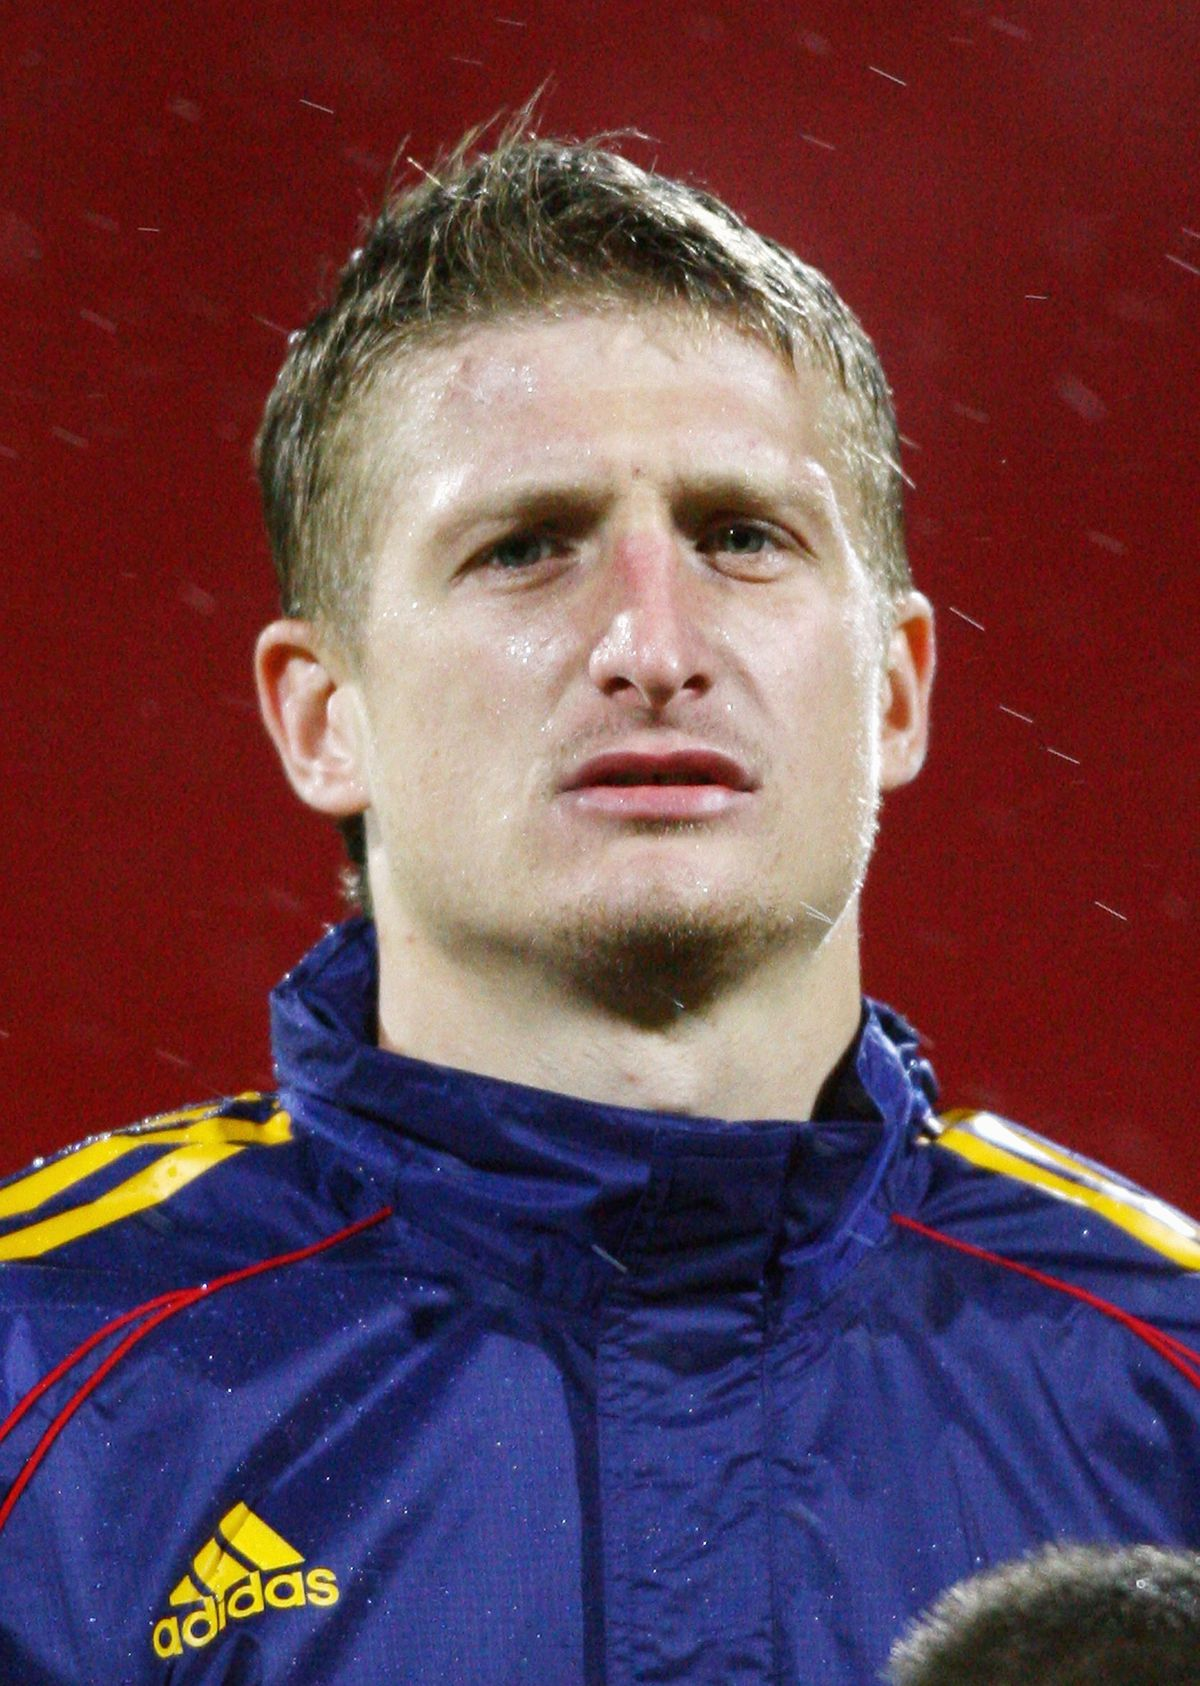 Euro2008 Qualifier - Romania v Netherlands